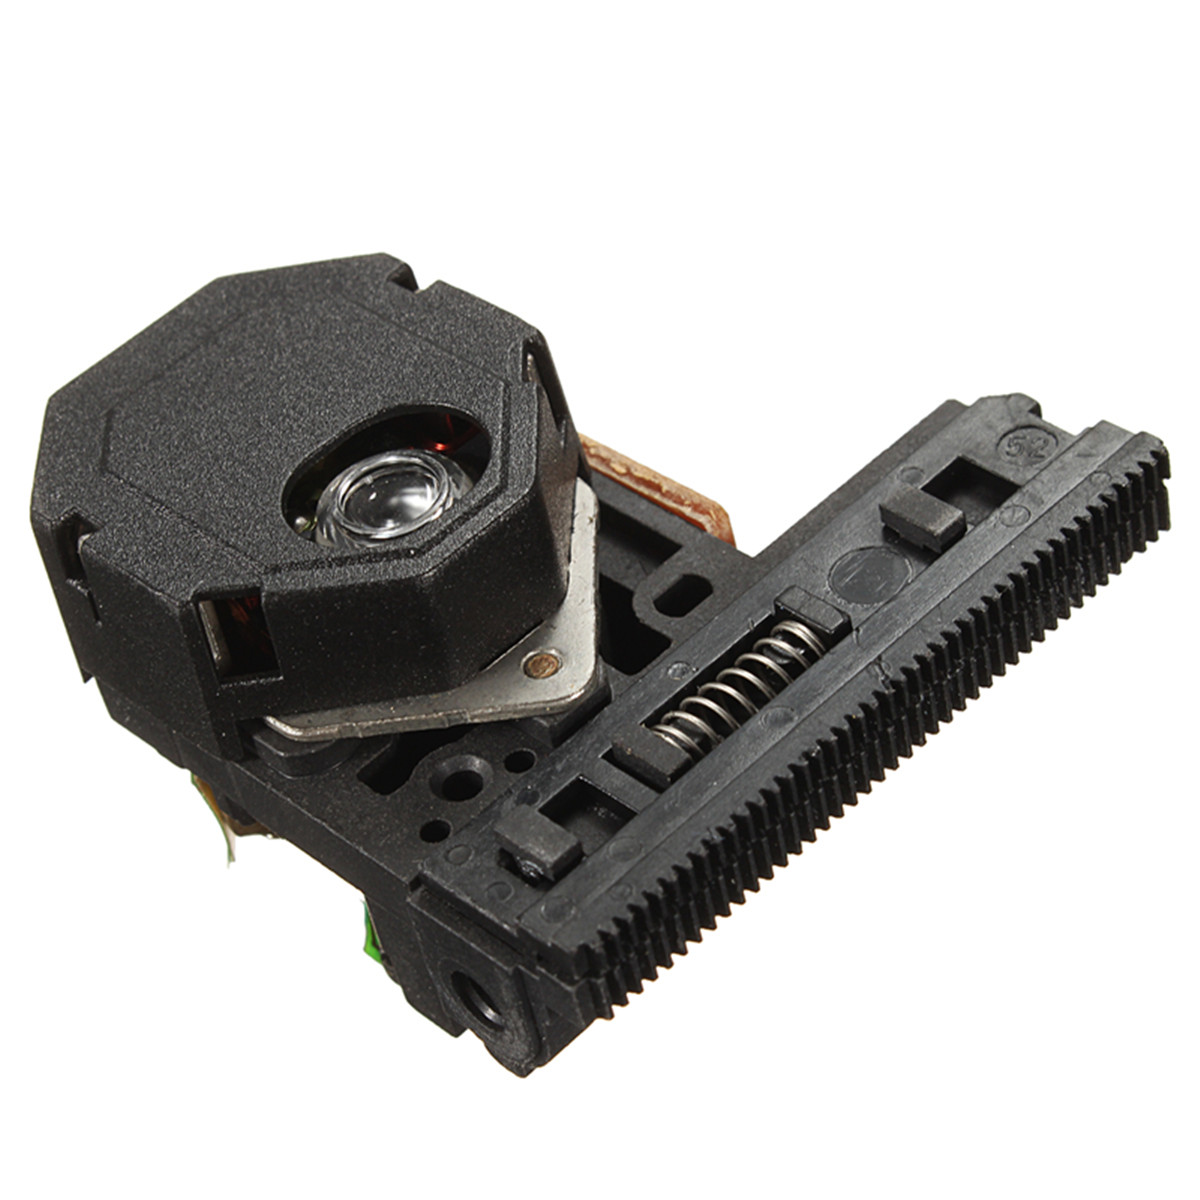 1pc New Black Universal Optical Pick UP Laser Lens CD Player Laser For SONY KSS-213C CD Player